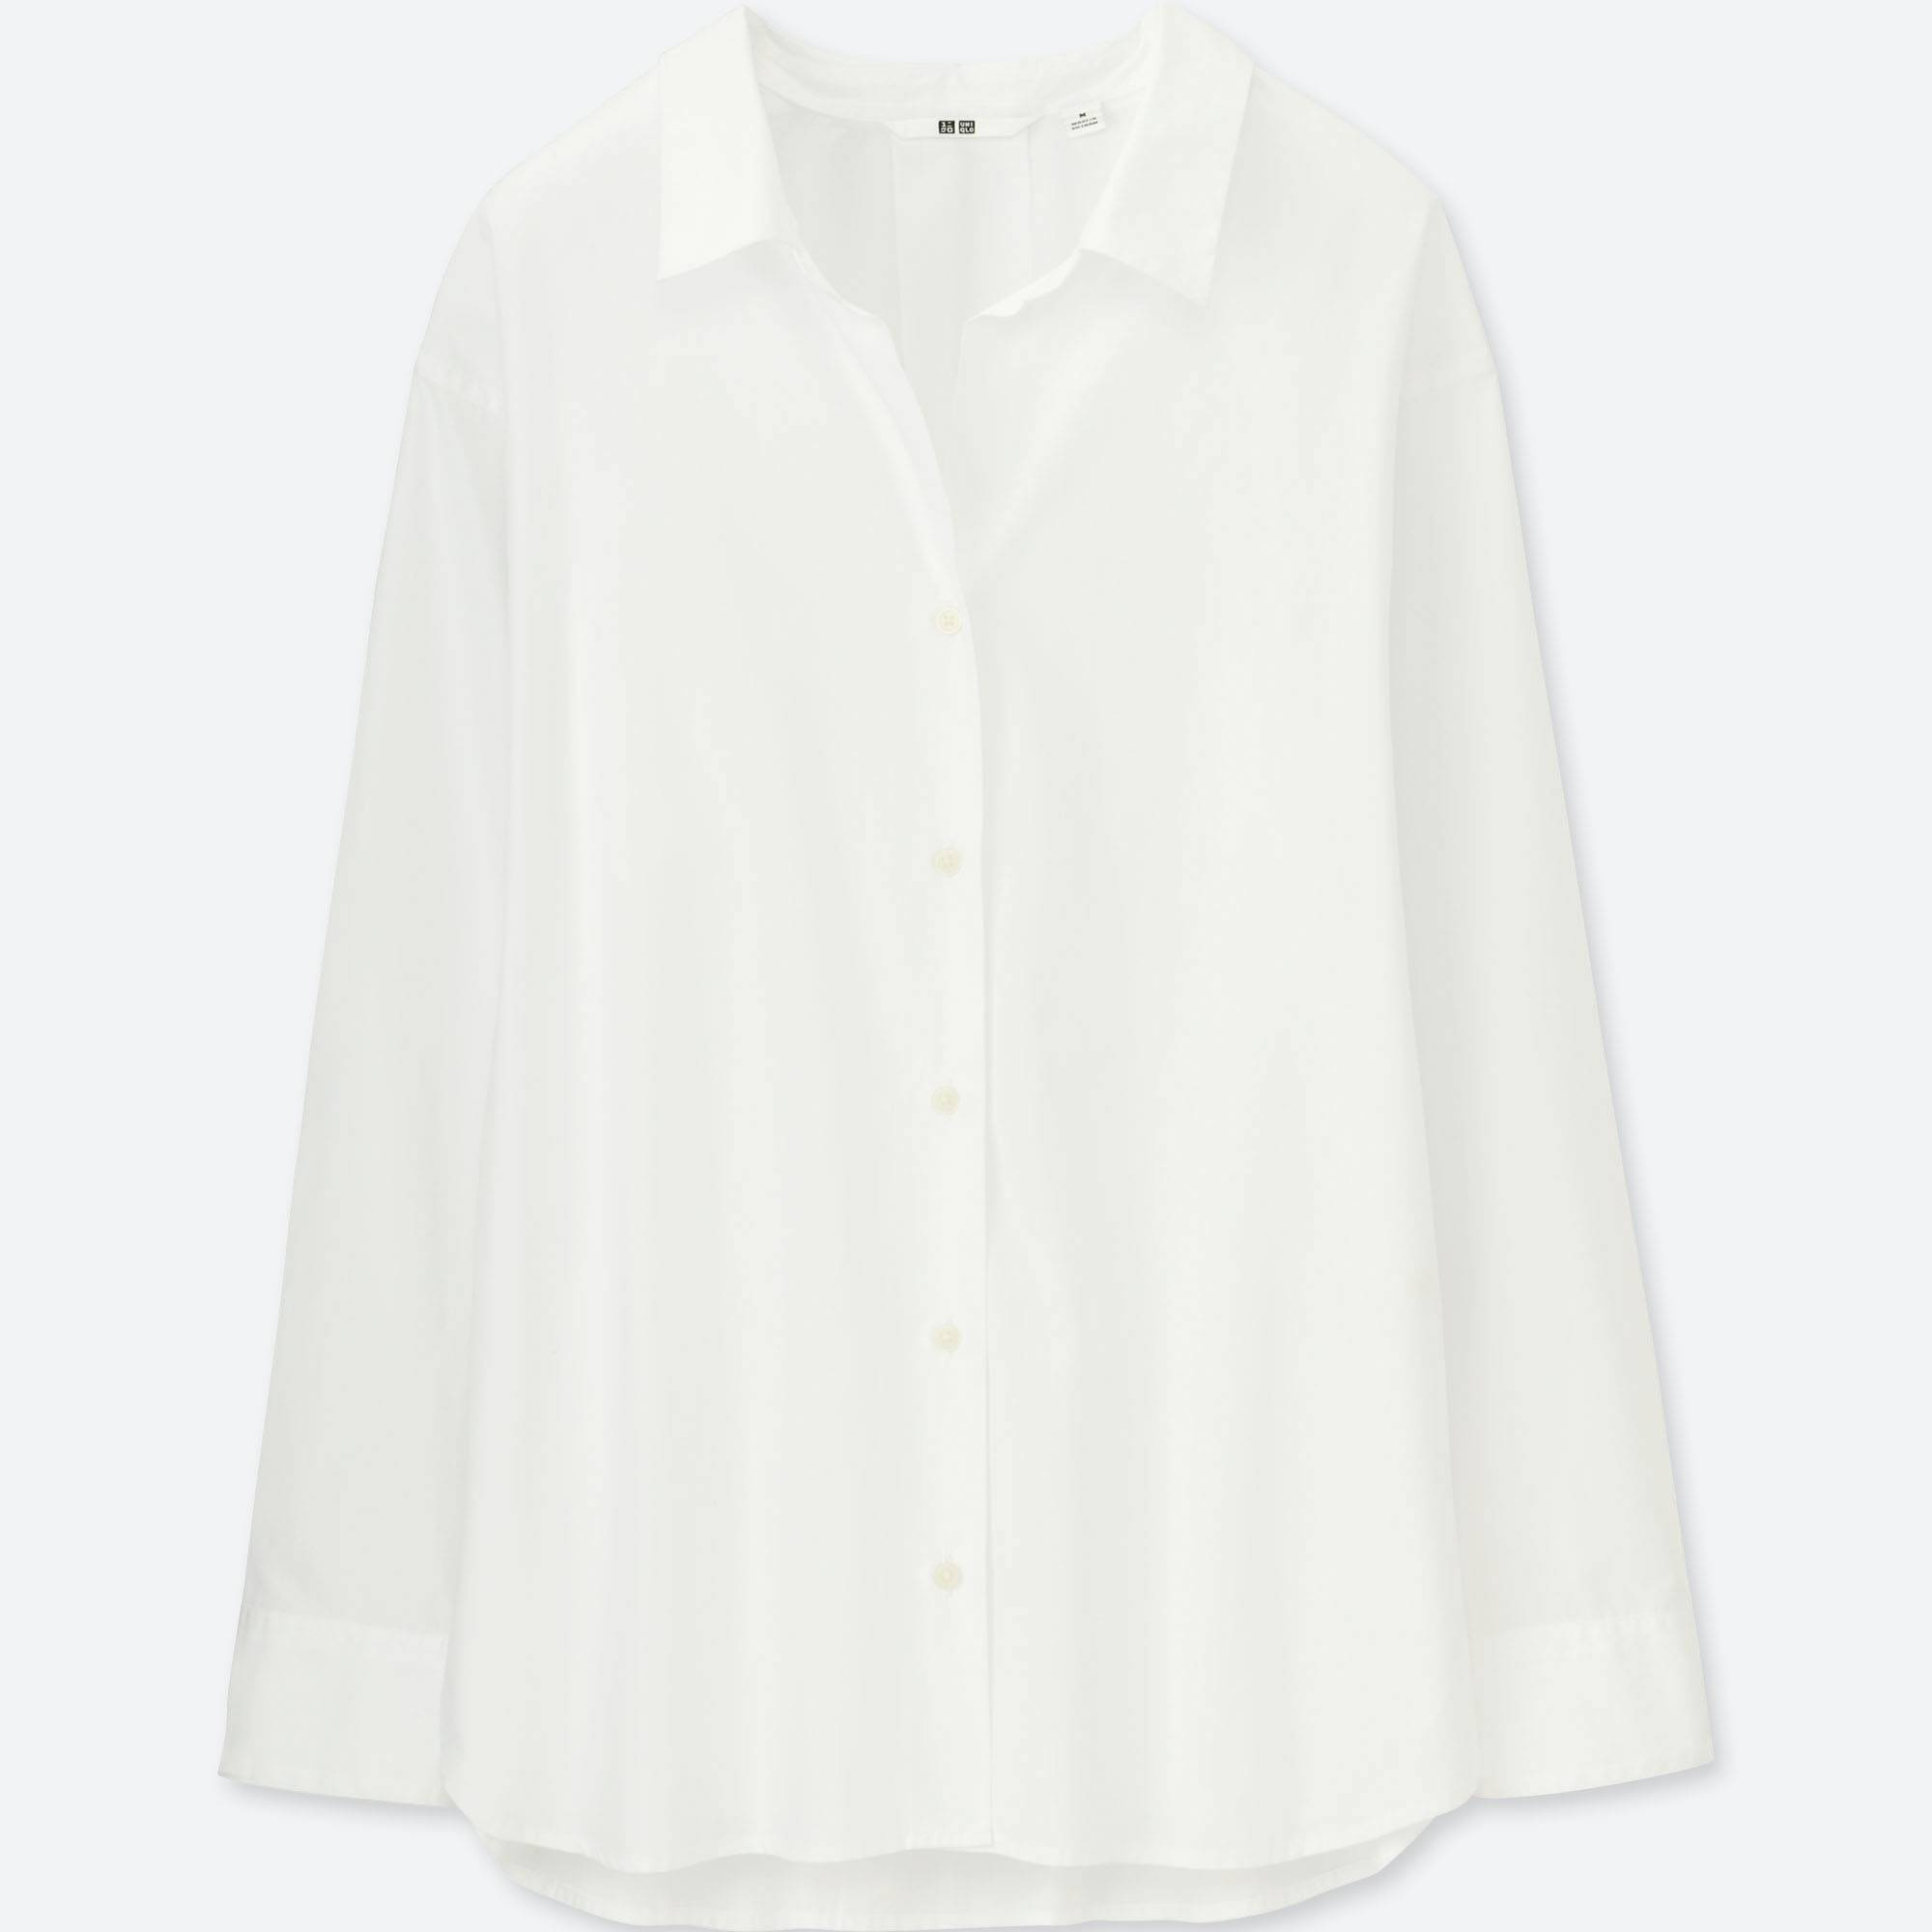 1c7b04f2 David Wej Plain Cotton Shirt- White. WOMEN EXTRA FINE COTTON LONG-SLEEVE  SHIRT | UNIQLO US